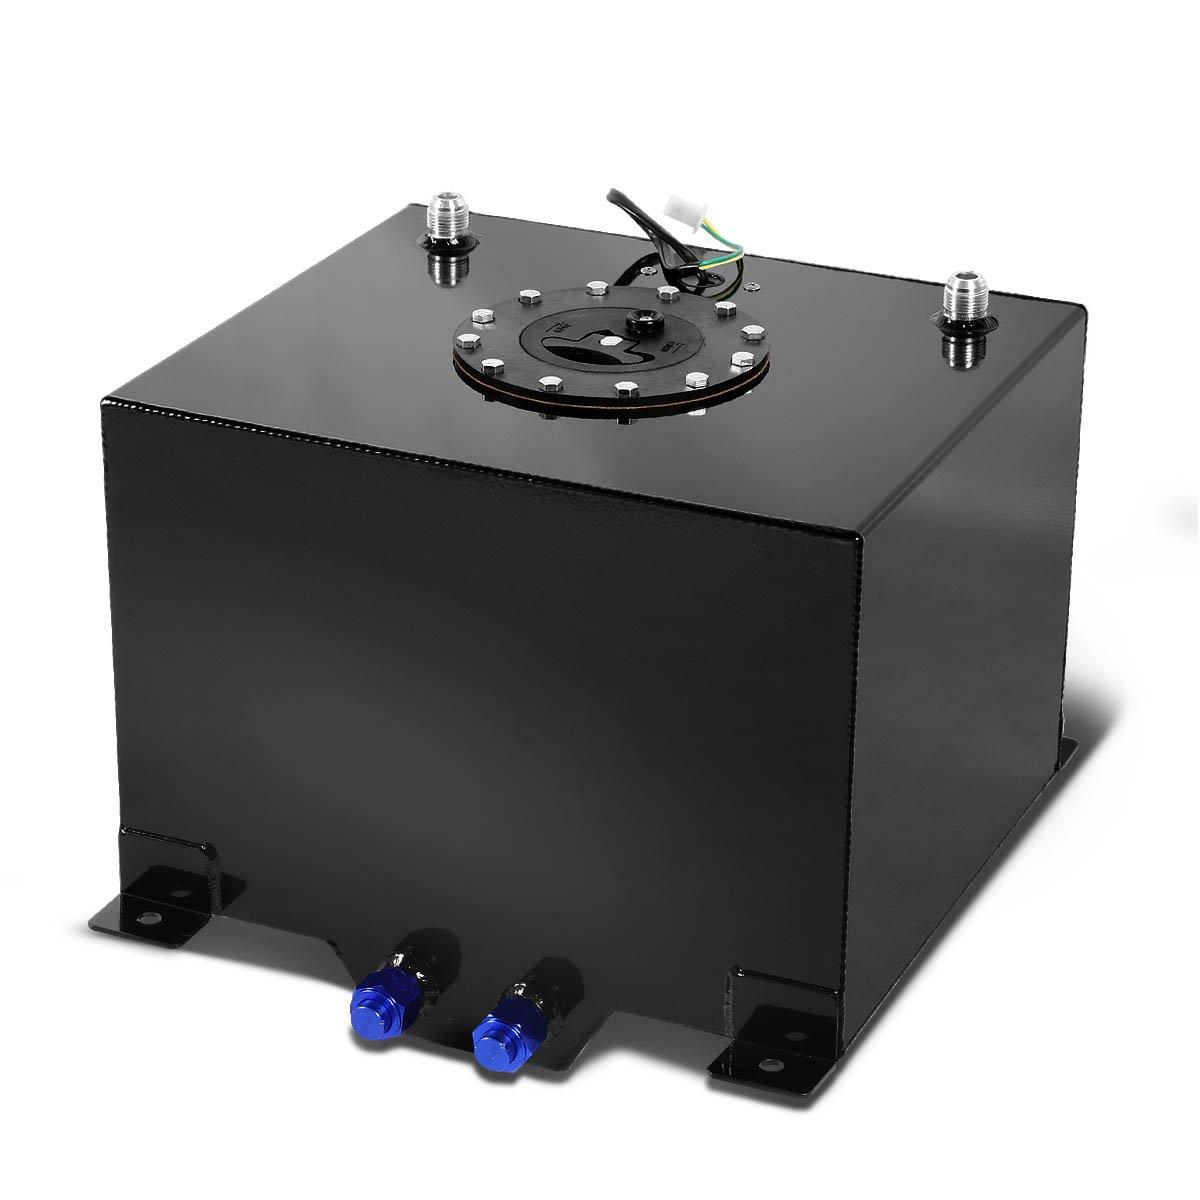 DNAMotoring ALU-FT-T3-BK Aluminum 8-Gallon Fuel Cell Gas Tank DNA Motoring